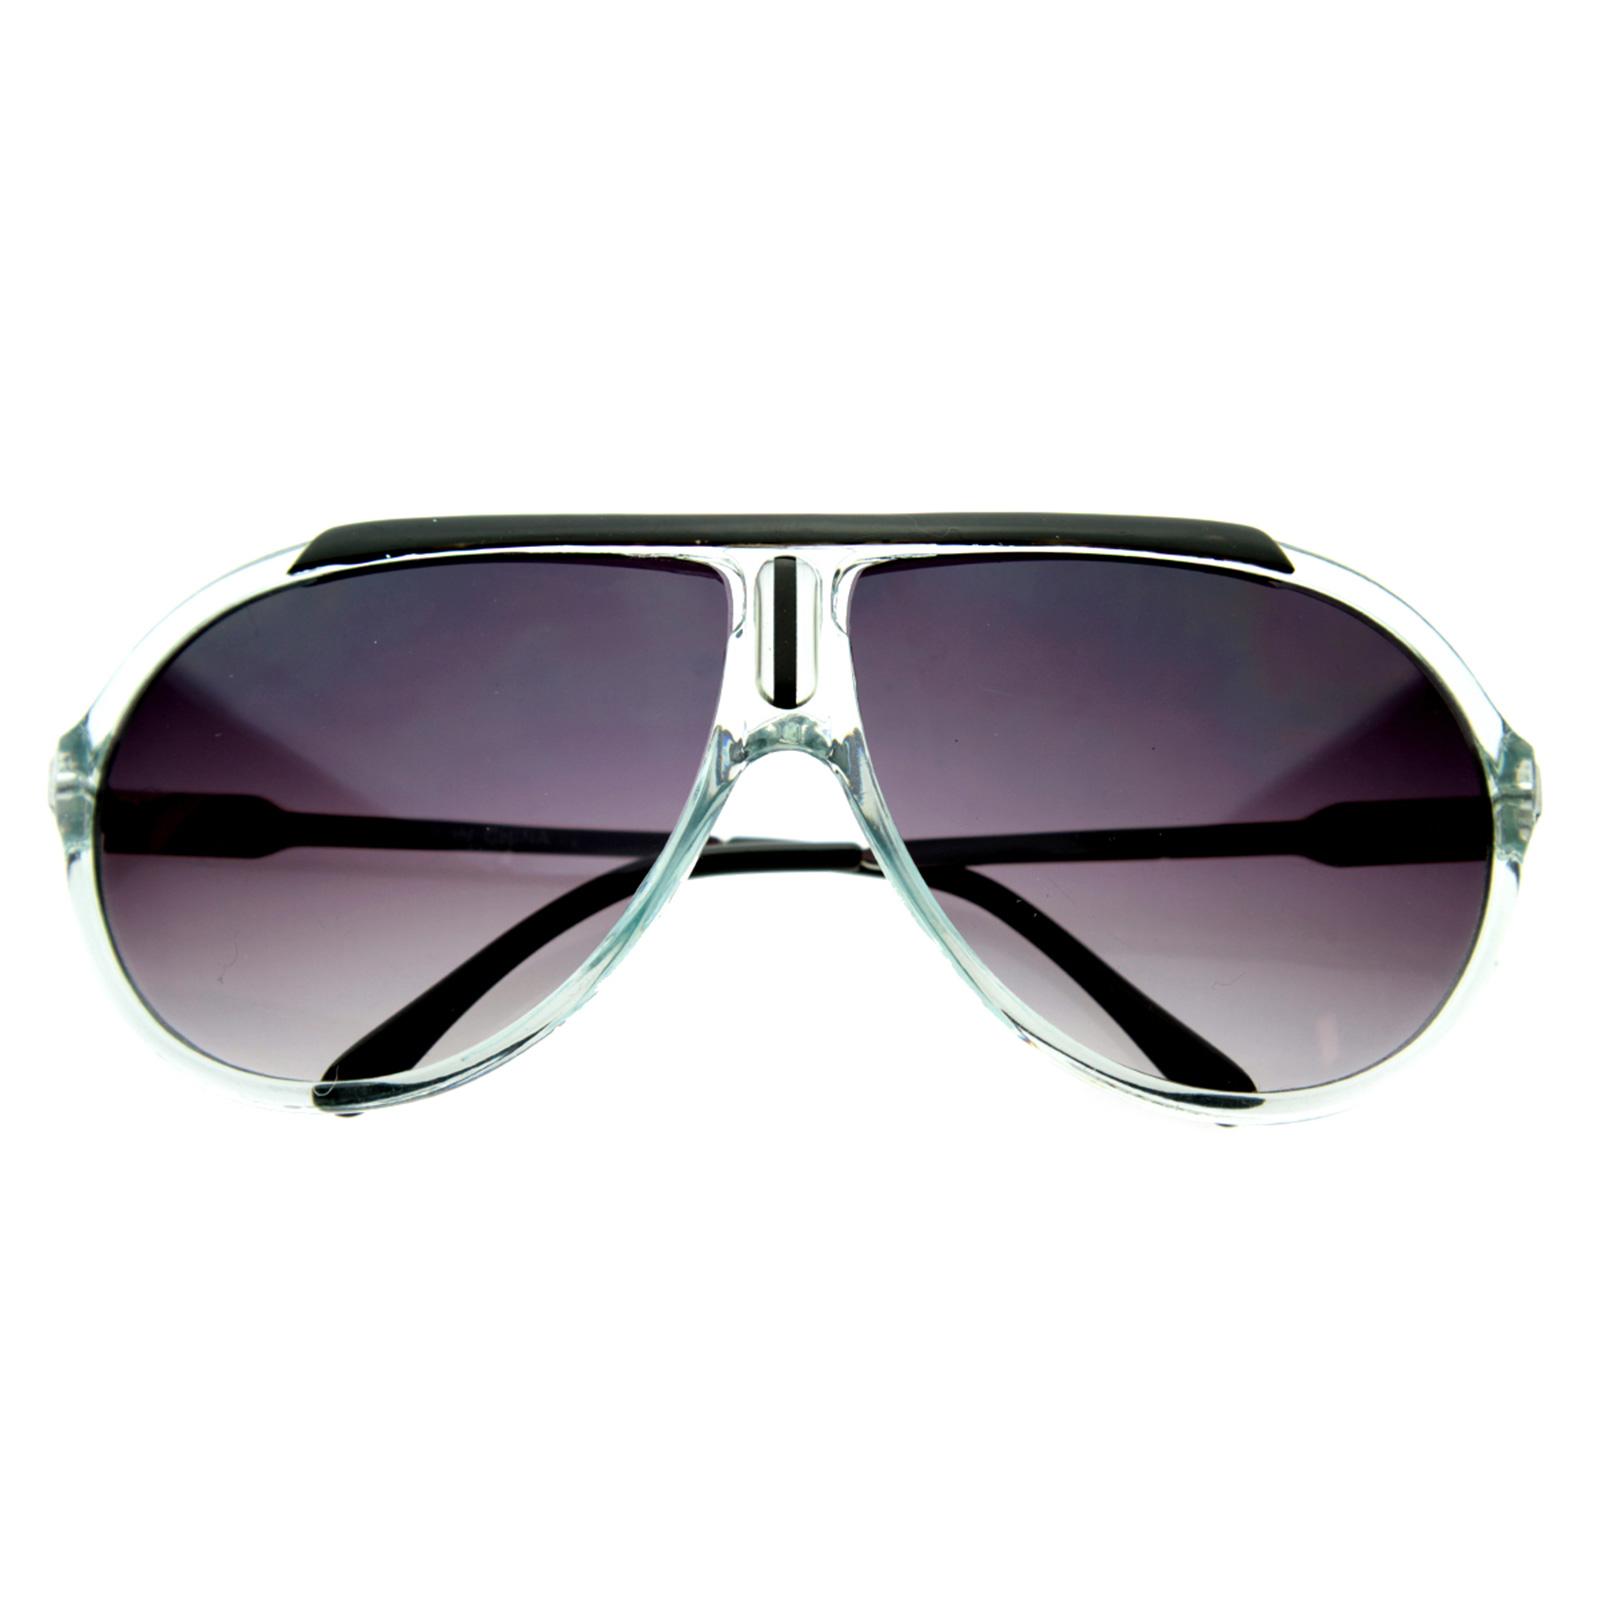 Designer-Inspired-80s-Style-Retro-Sport-Aviator-Sunglasses